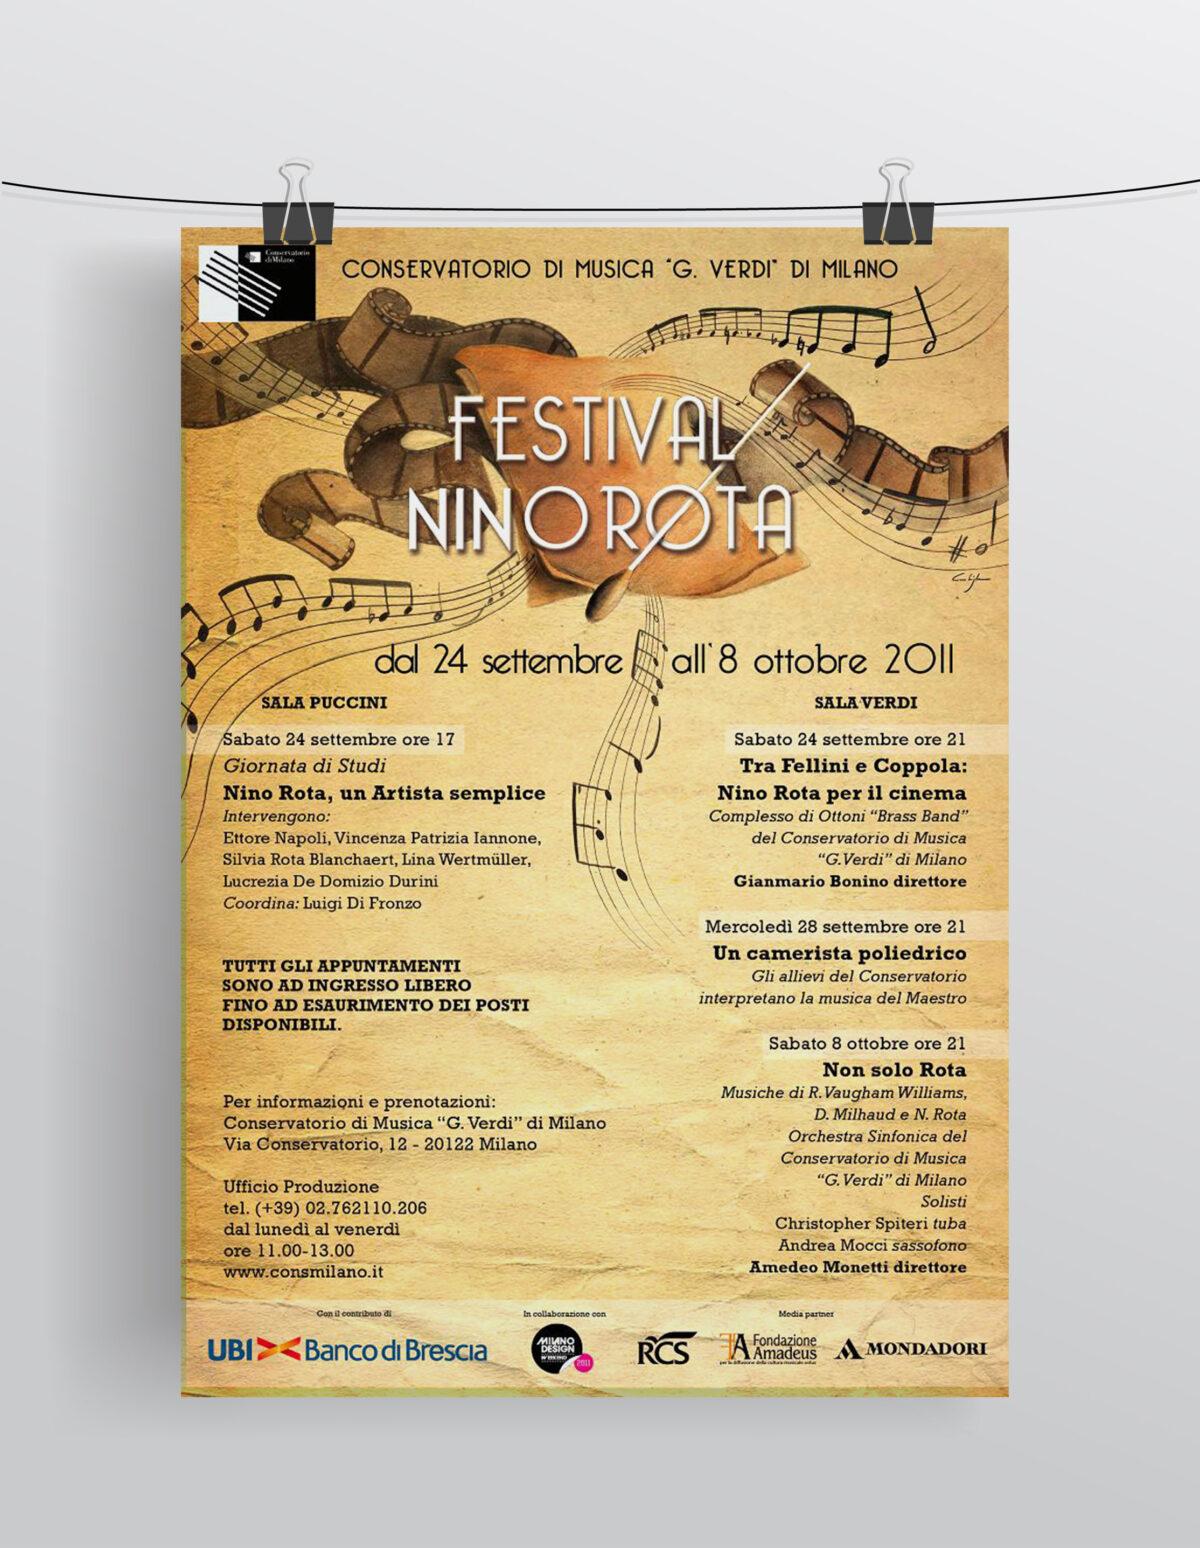 Festival Nino Rota - Locandina 2011